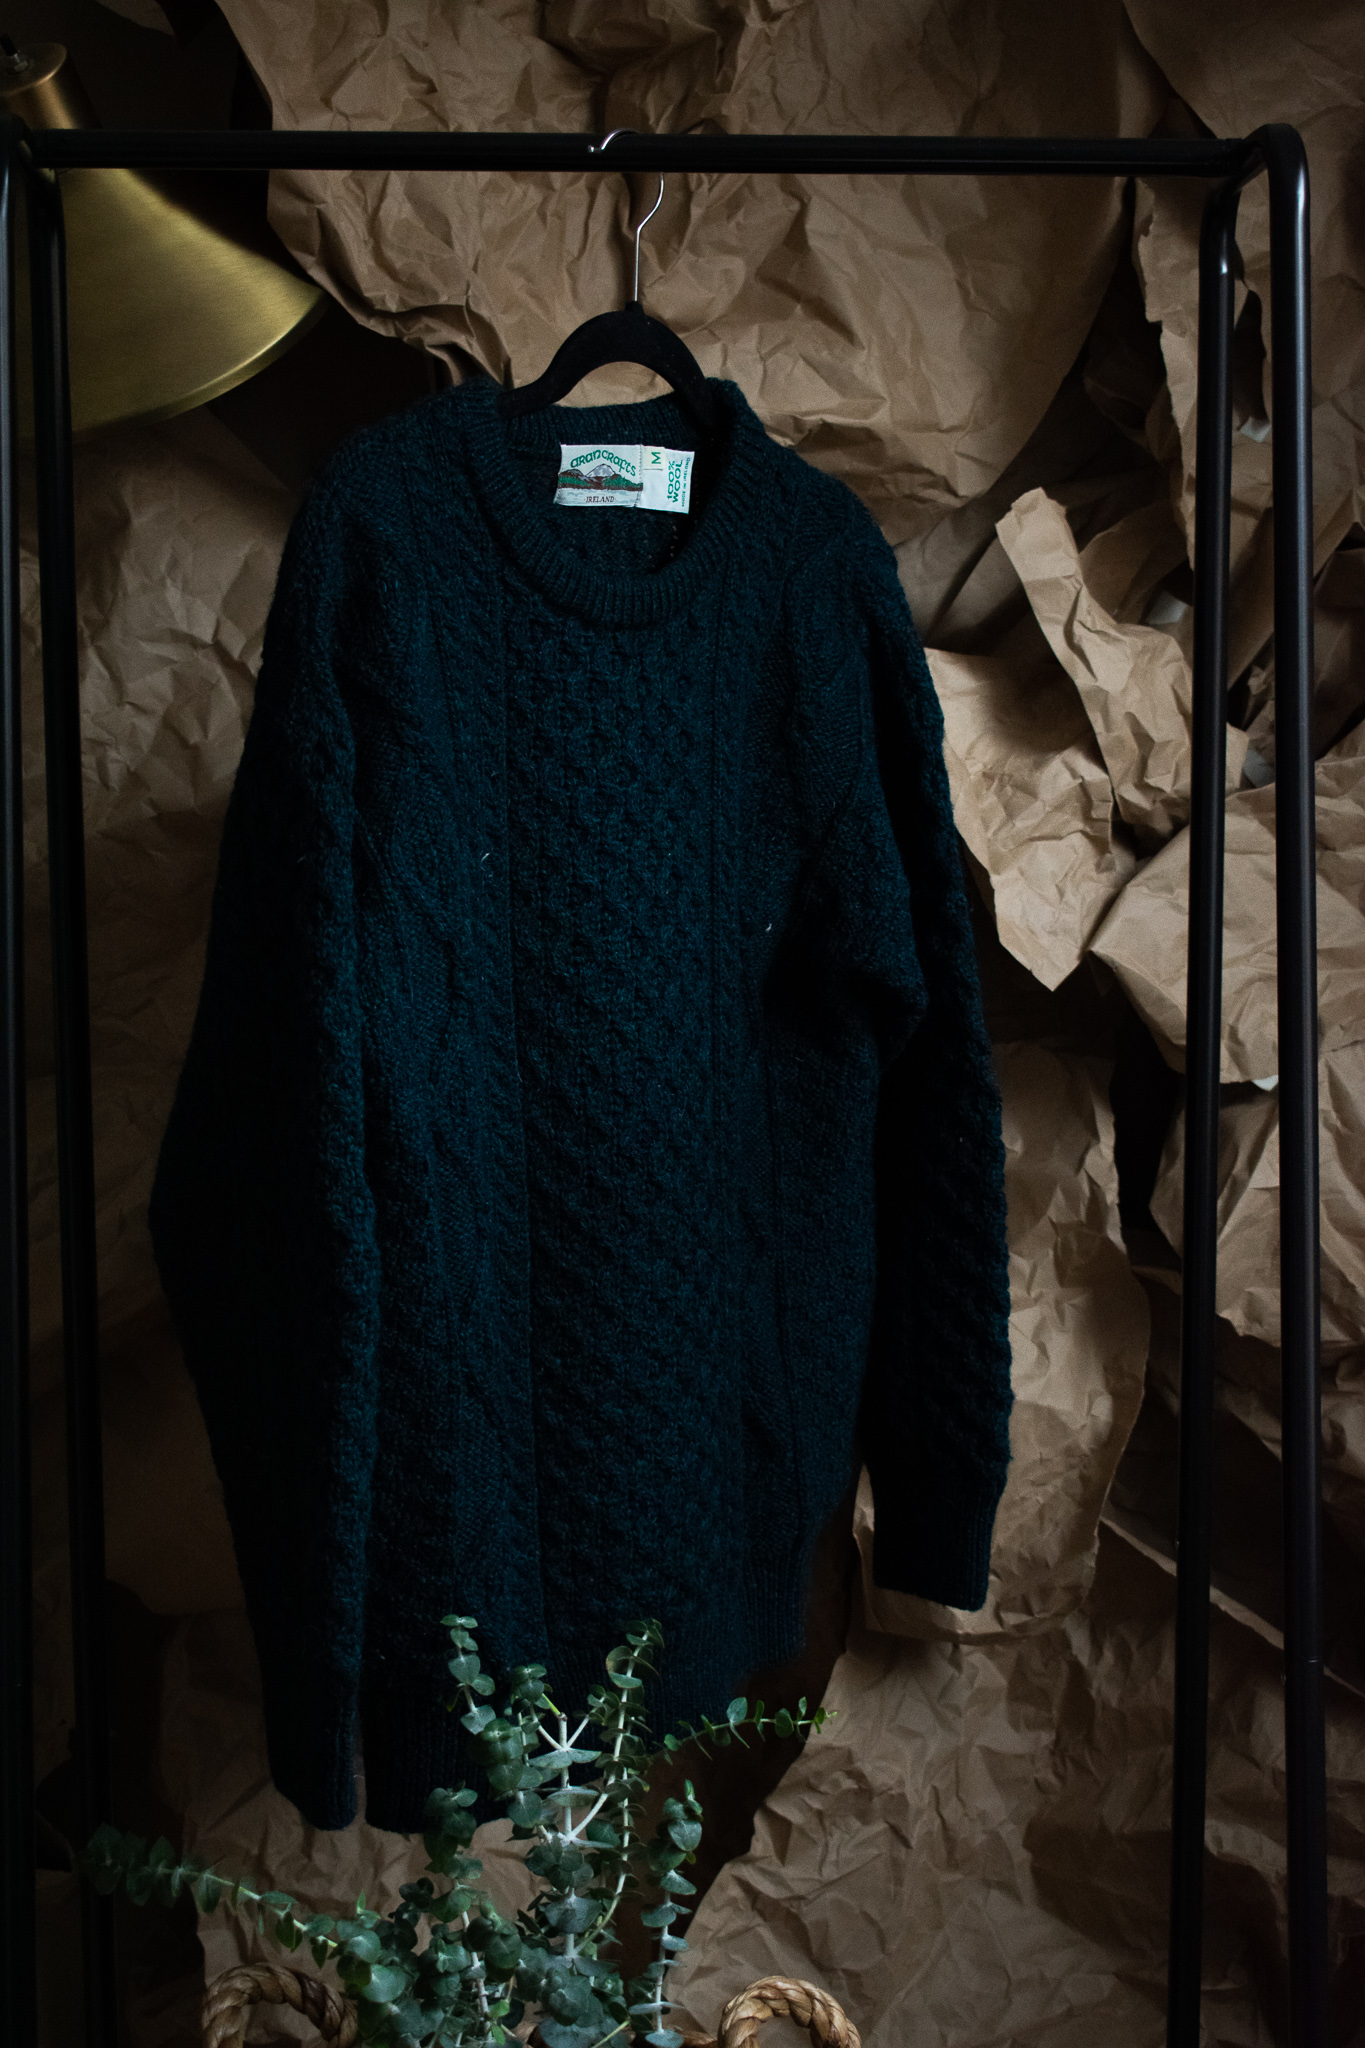 irish wool jumper. 4 years. $40. good as new.